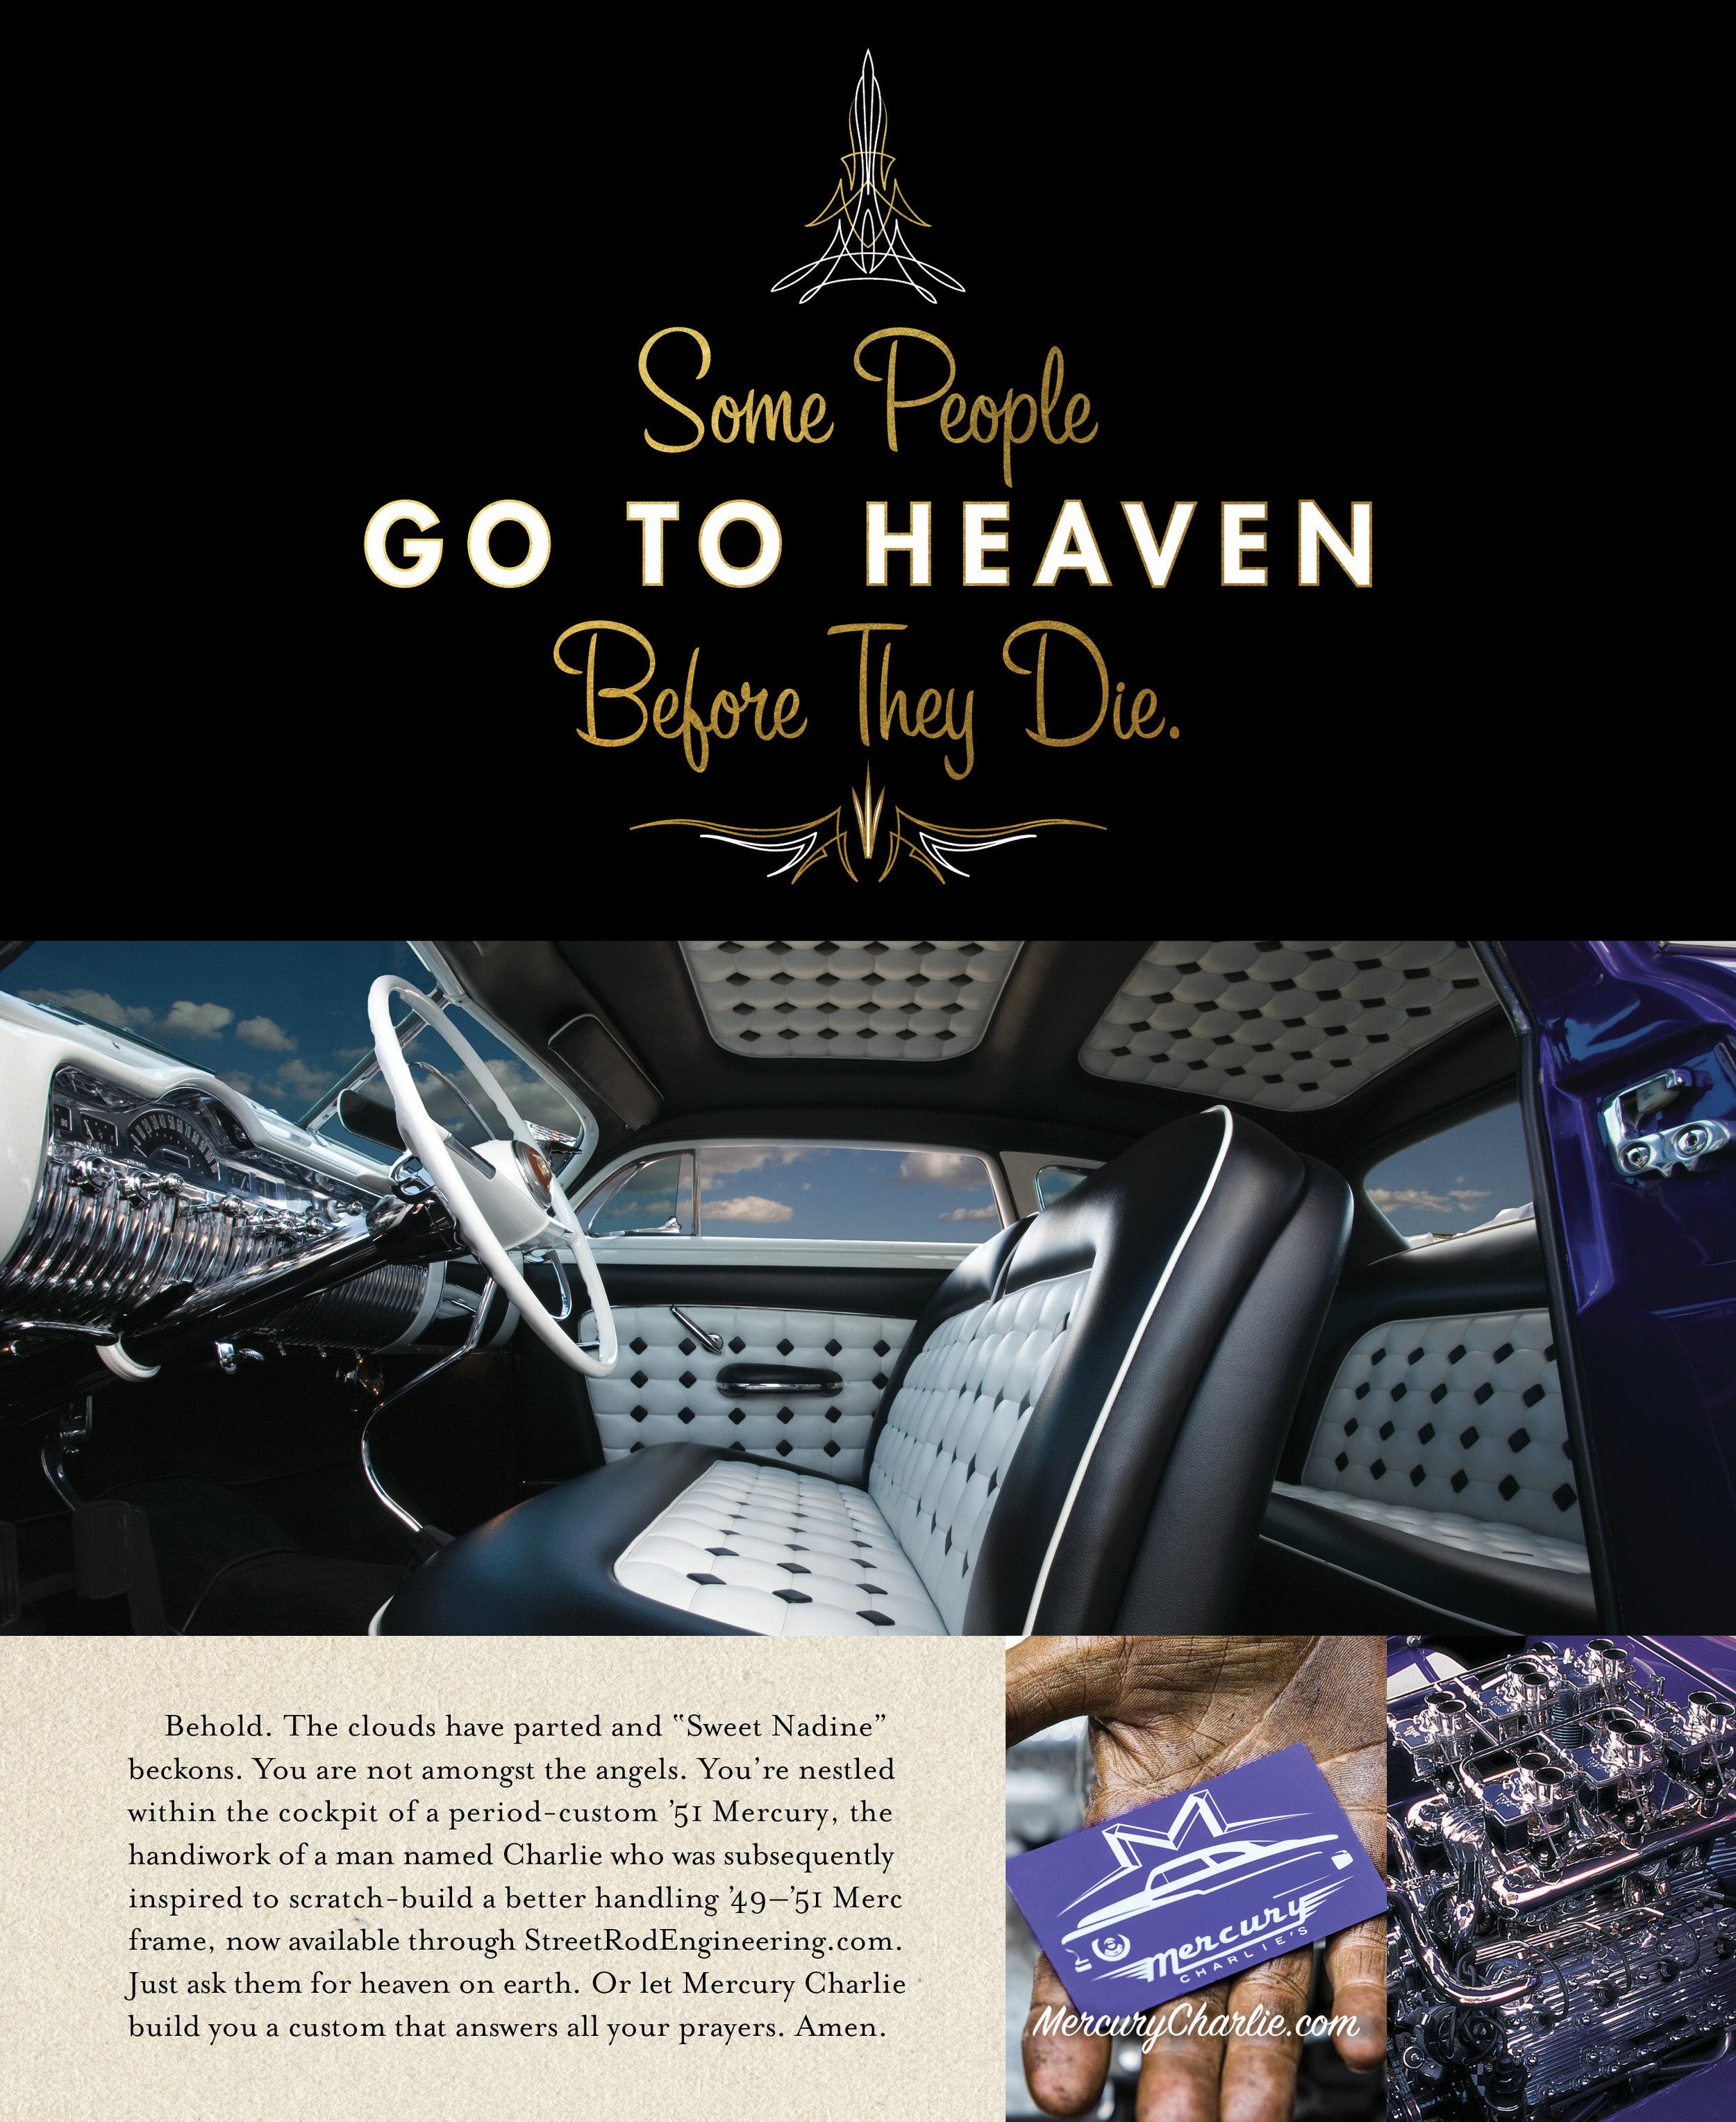 Mercury Charlie_Go To Heaven 1pg Final.jpg